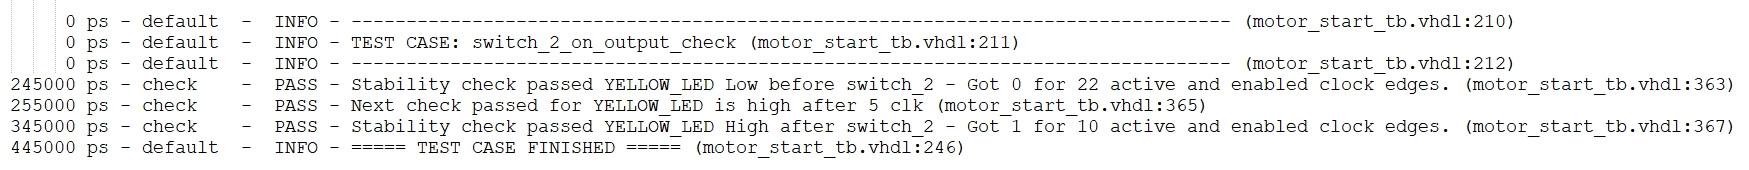 Output from VUnit test case